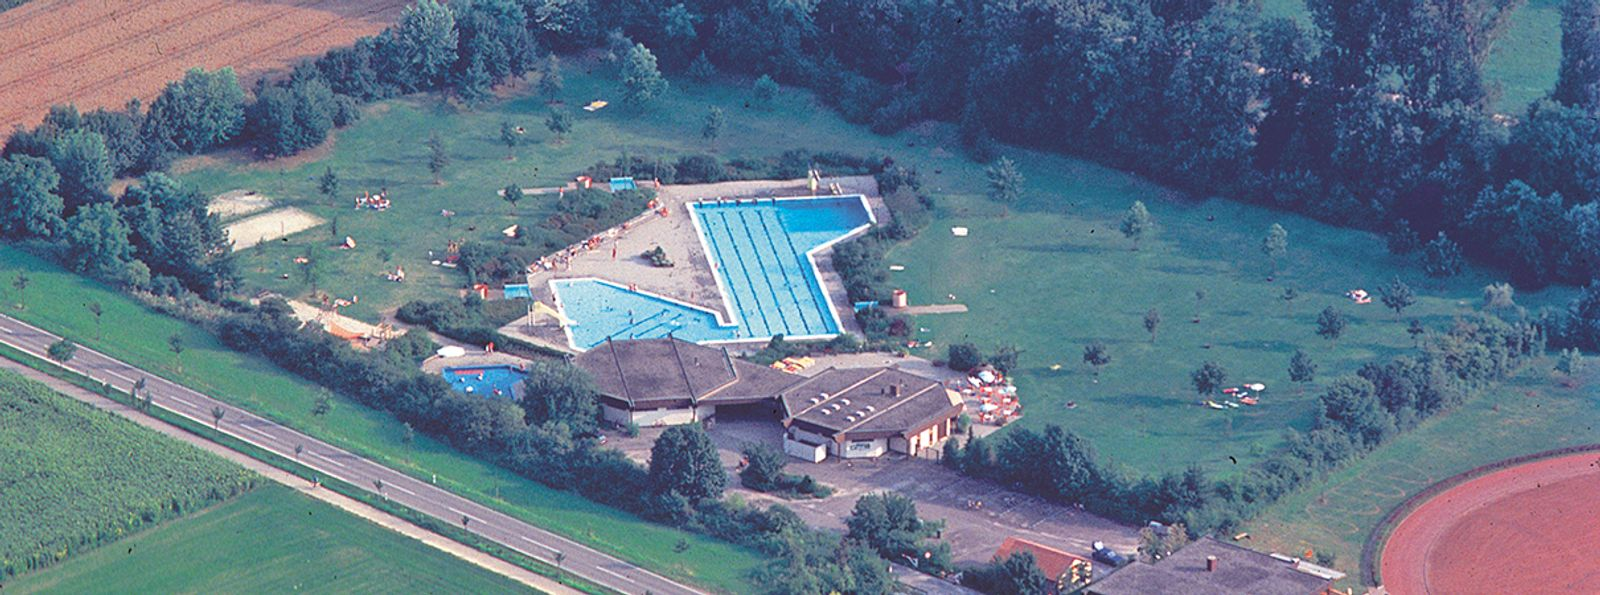 Sportbad Heitersheim (So., 12.07.)